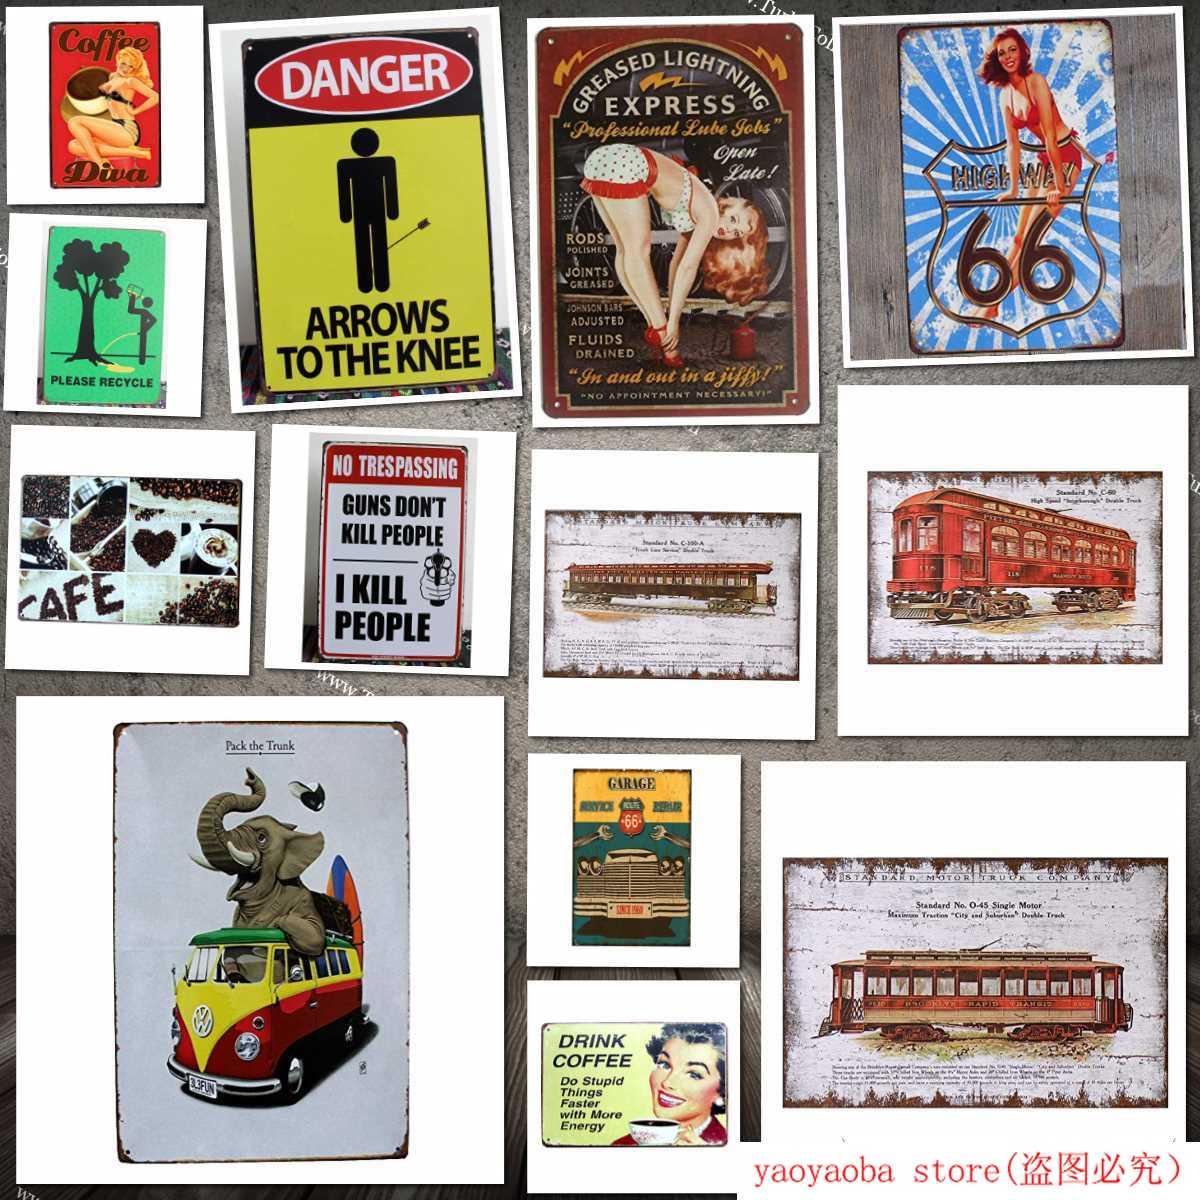 Peligro Arrous Tothe Knee Vintage Metal signo signos para cochera para hombres hogar Decoración estaño arte decoración señal de advertencia